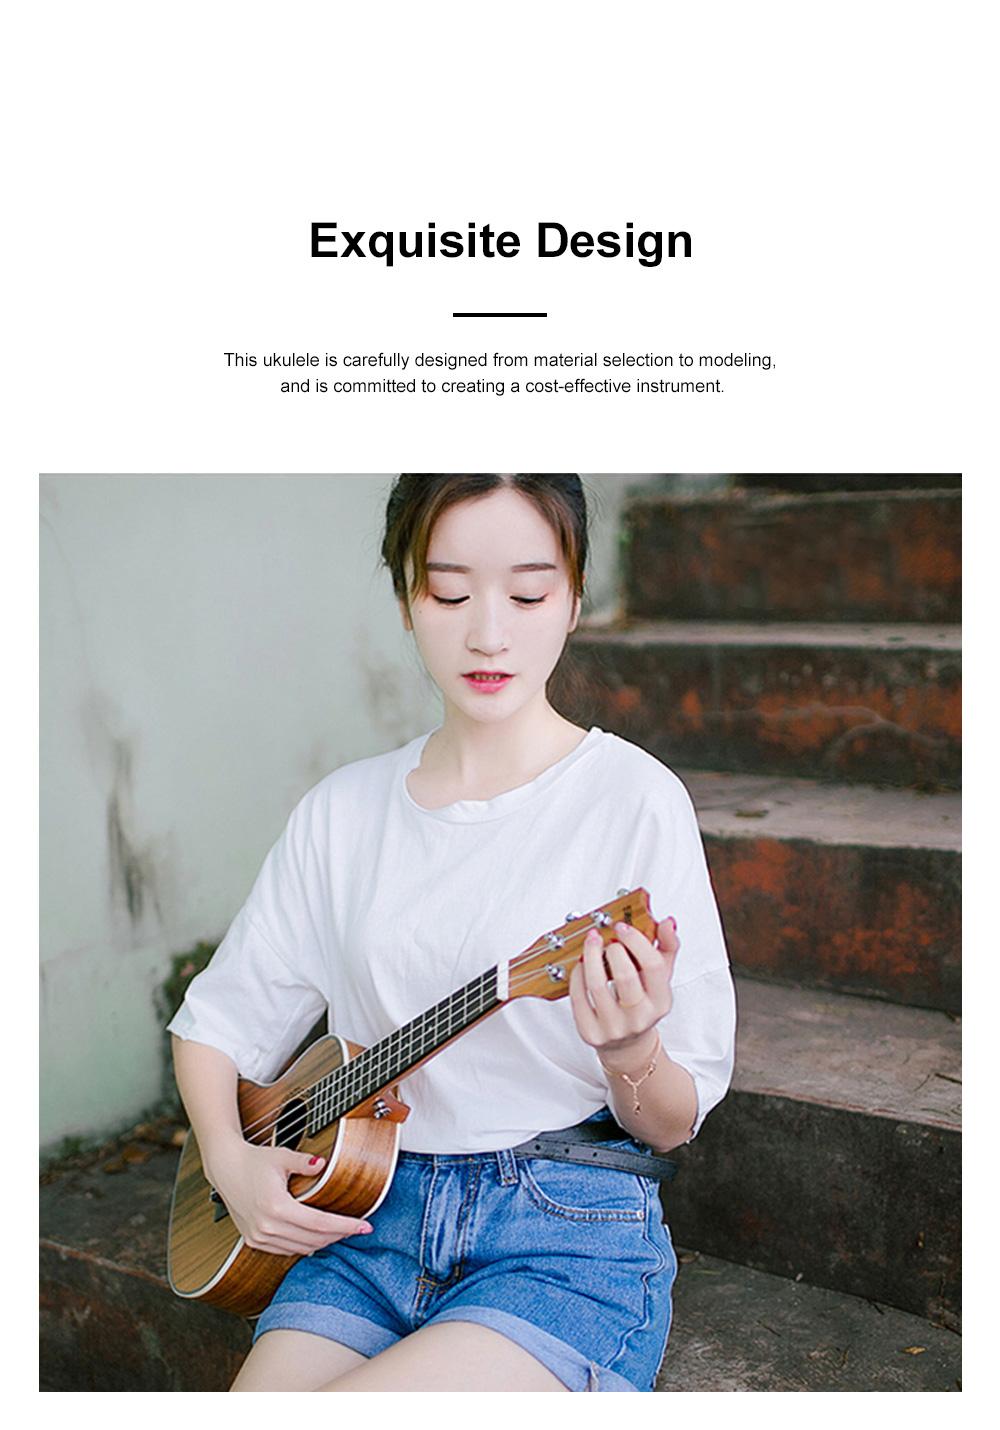 Originality Ukulele Four String 23 inch Guitar with High Level Rose Wood & Head Easy Leaning Ukulele Gift for Beginner 7